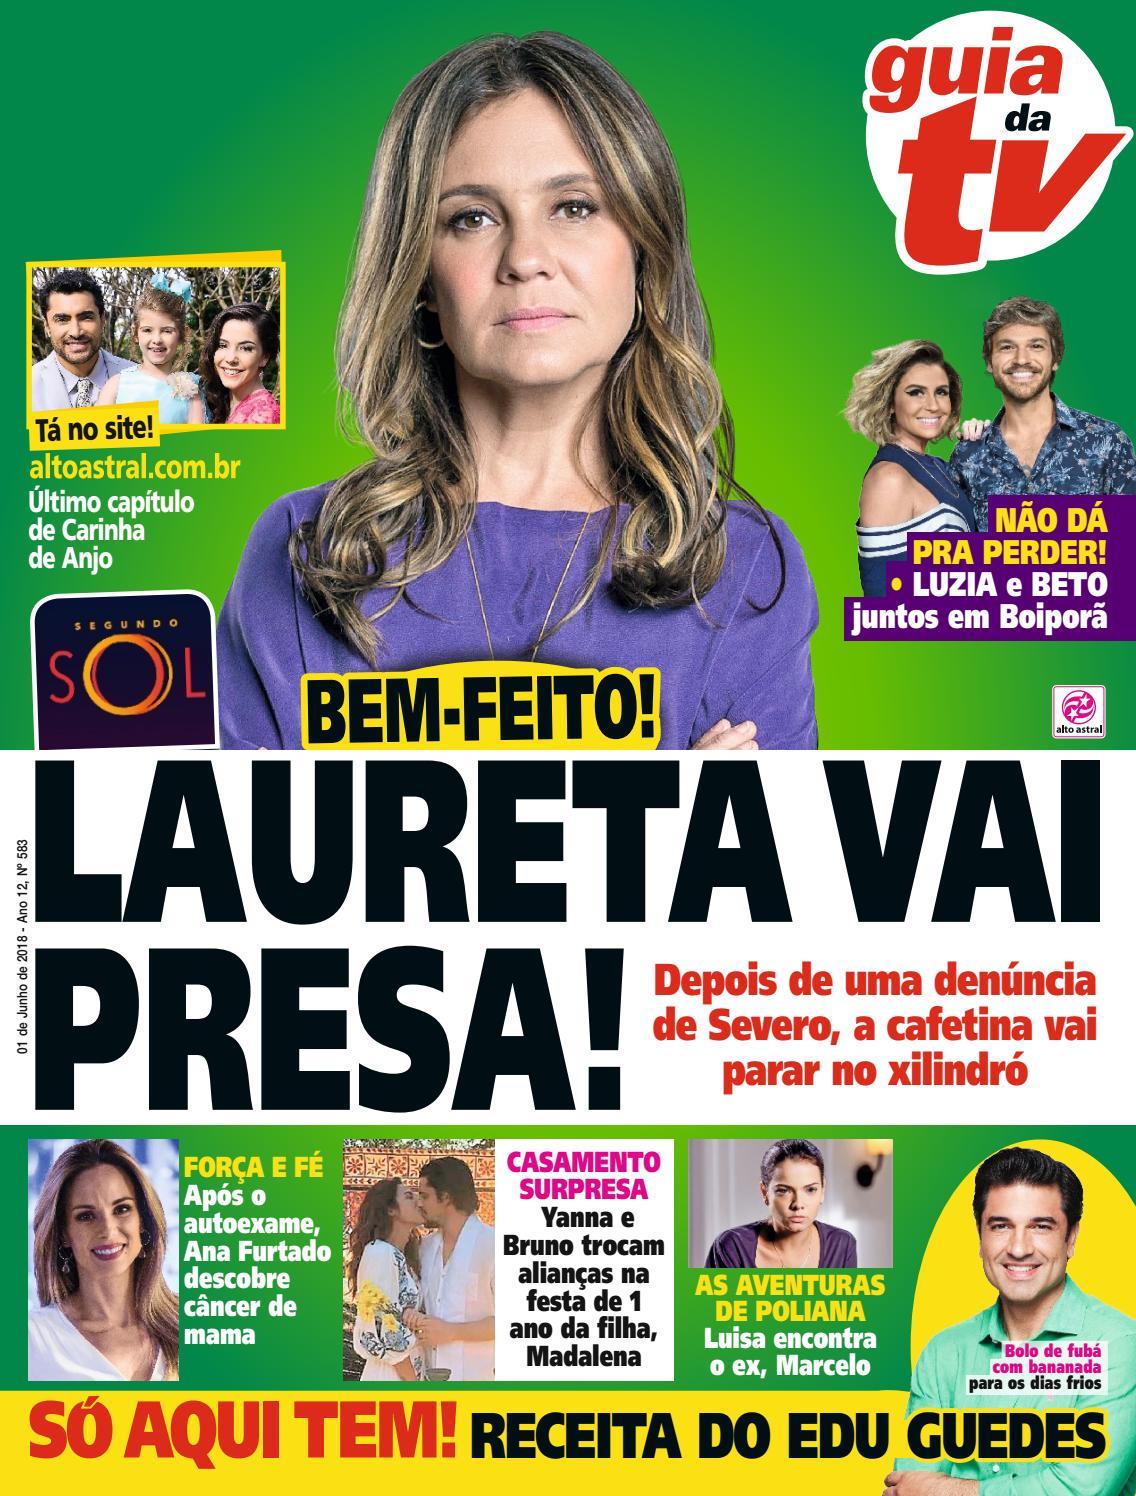 57b29ef0f02 Revista GUIA DA TV 583 by Alto Astral - issuu